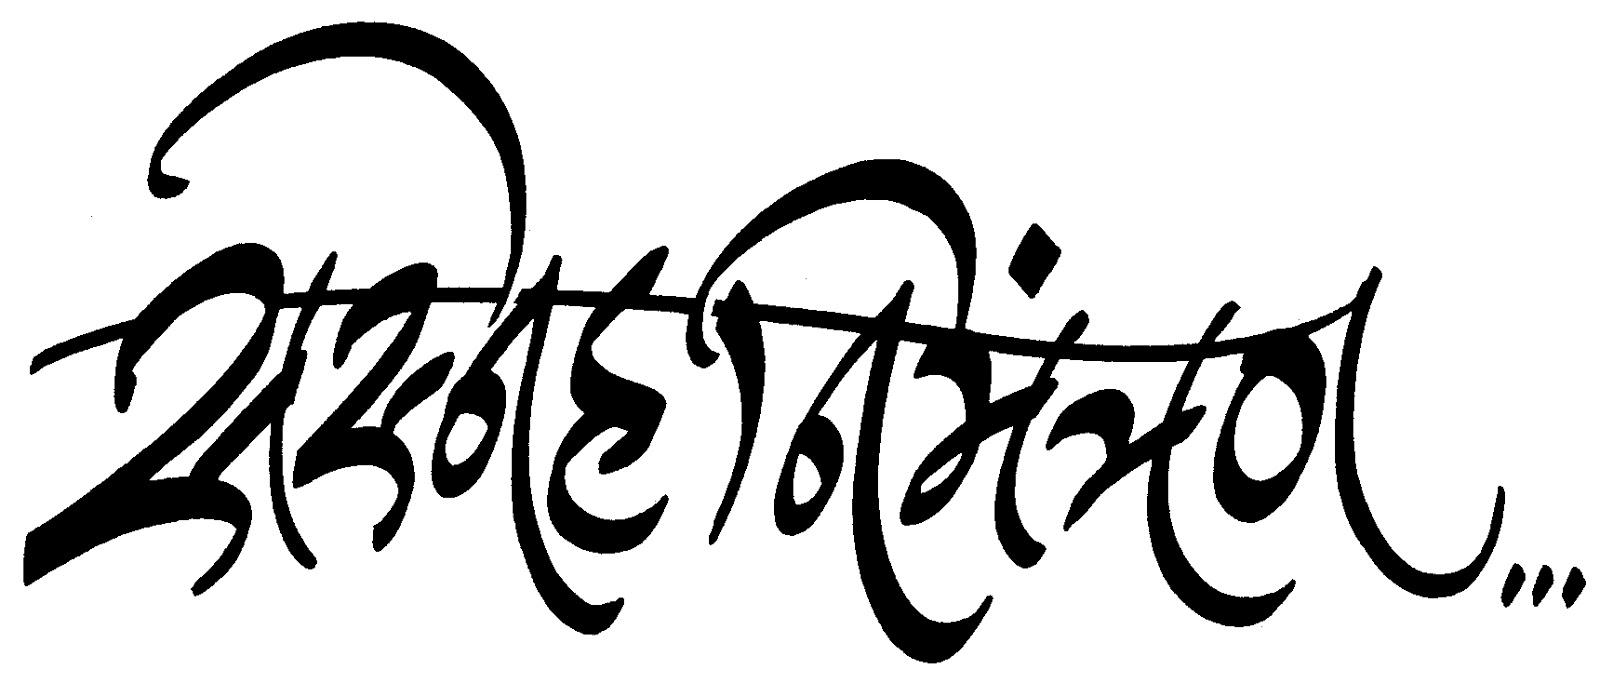 In marathi clipart #16